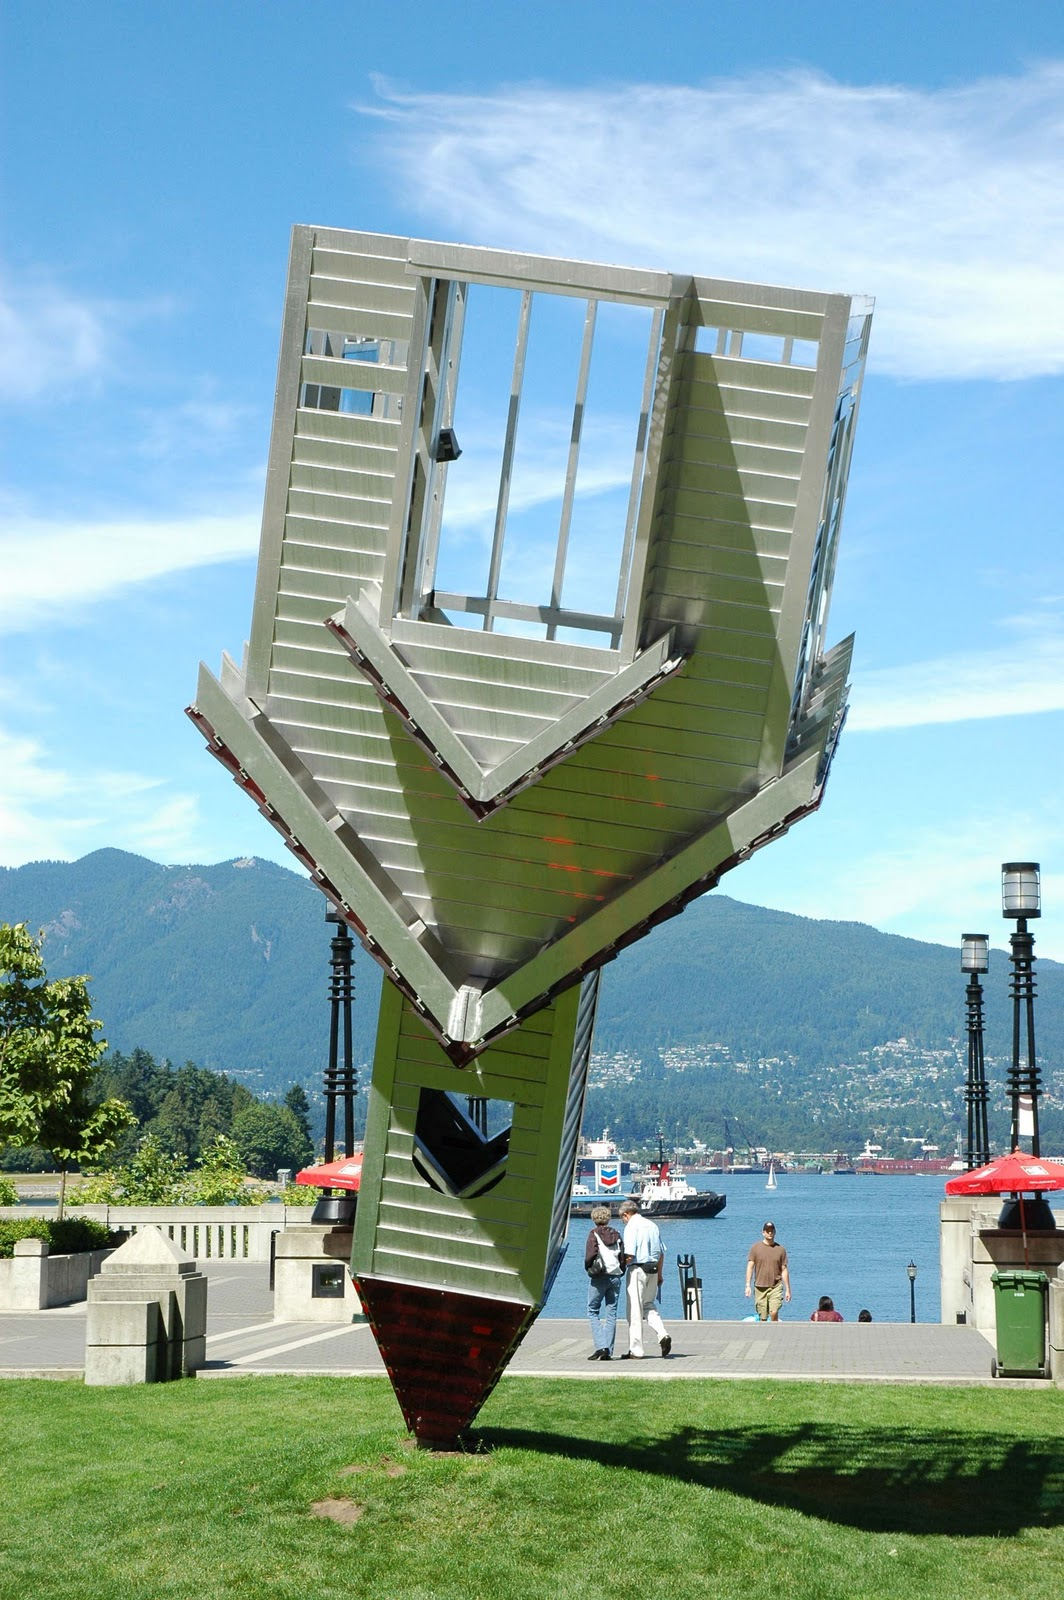 http://2.bp.blogspot.com/-4NkzRjLveGo/TogolQg-RWI/AAAAAAAACmw/b9CnMXvVlgo/s1600/Evil+Vancouver+Canada.jpg4.jpg